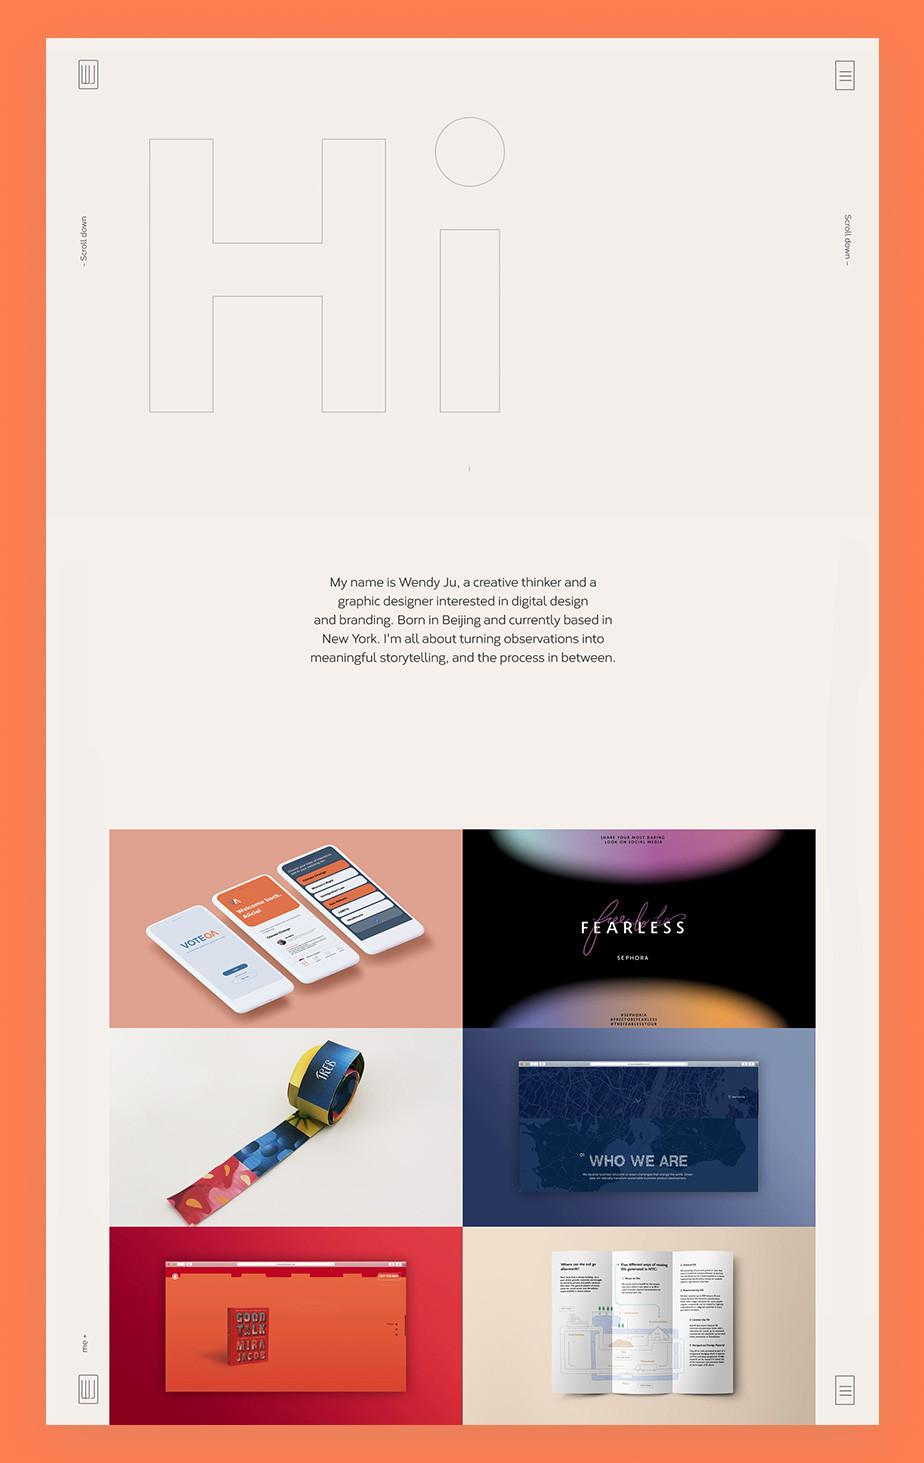 Wendy Ju animated graphic design portfolio